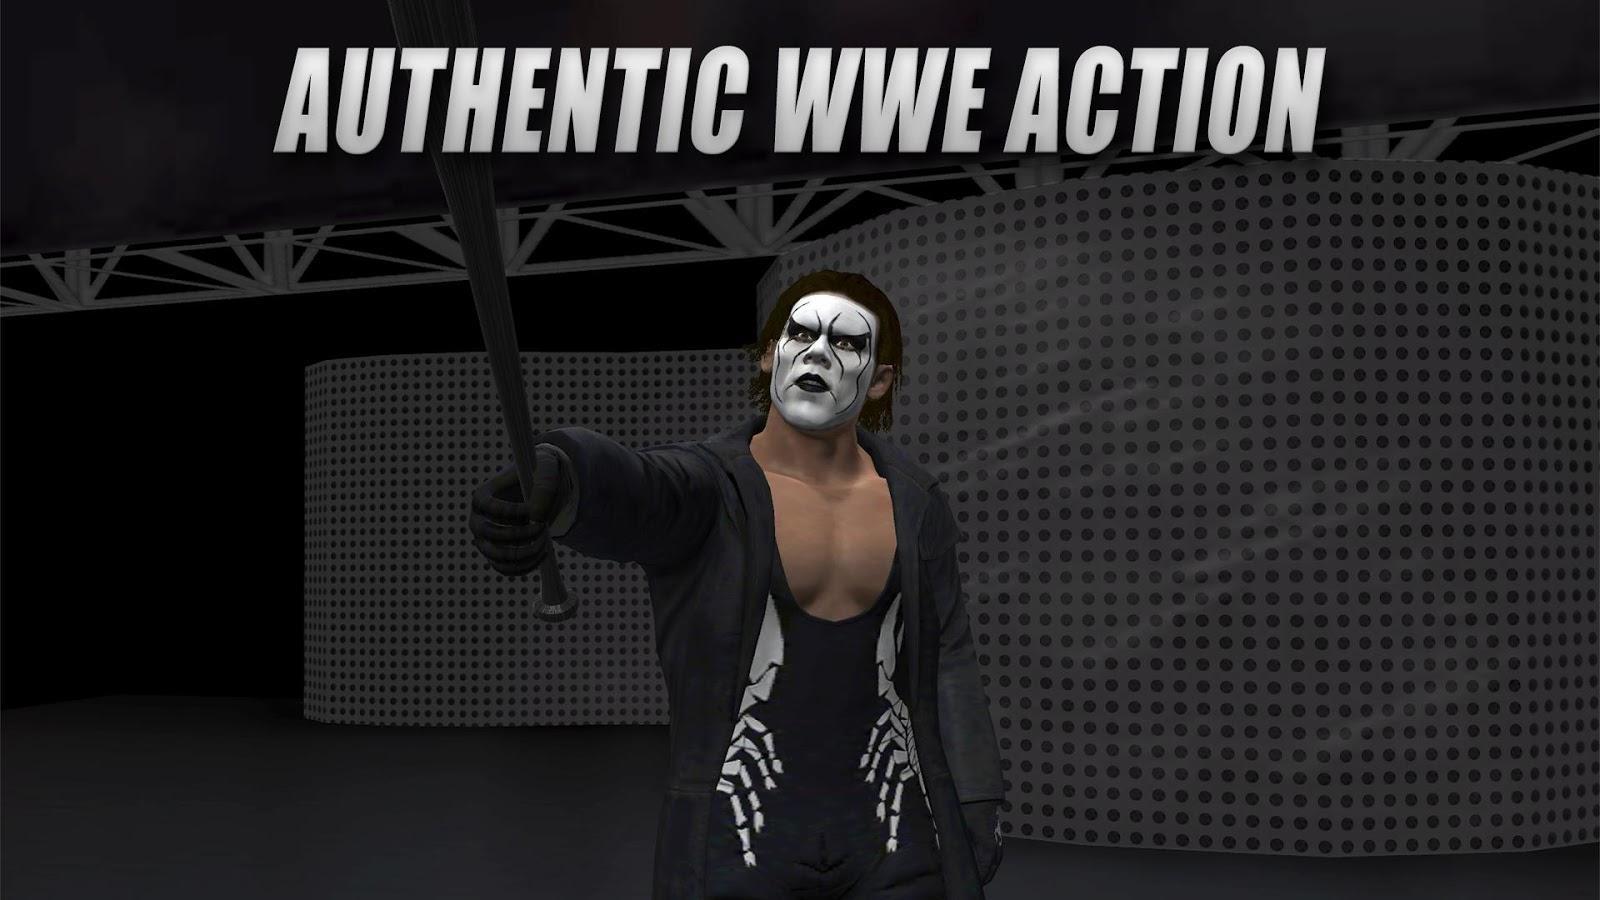 WWE 2K (MOD APK, Paid/Unlocked) v1.1.8117 5